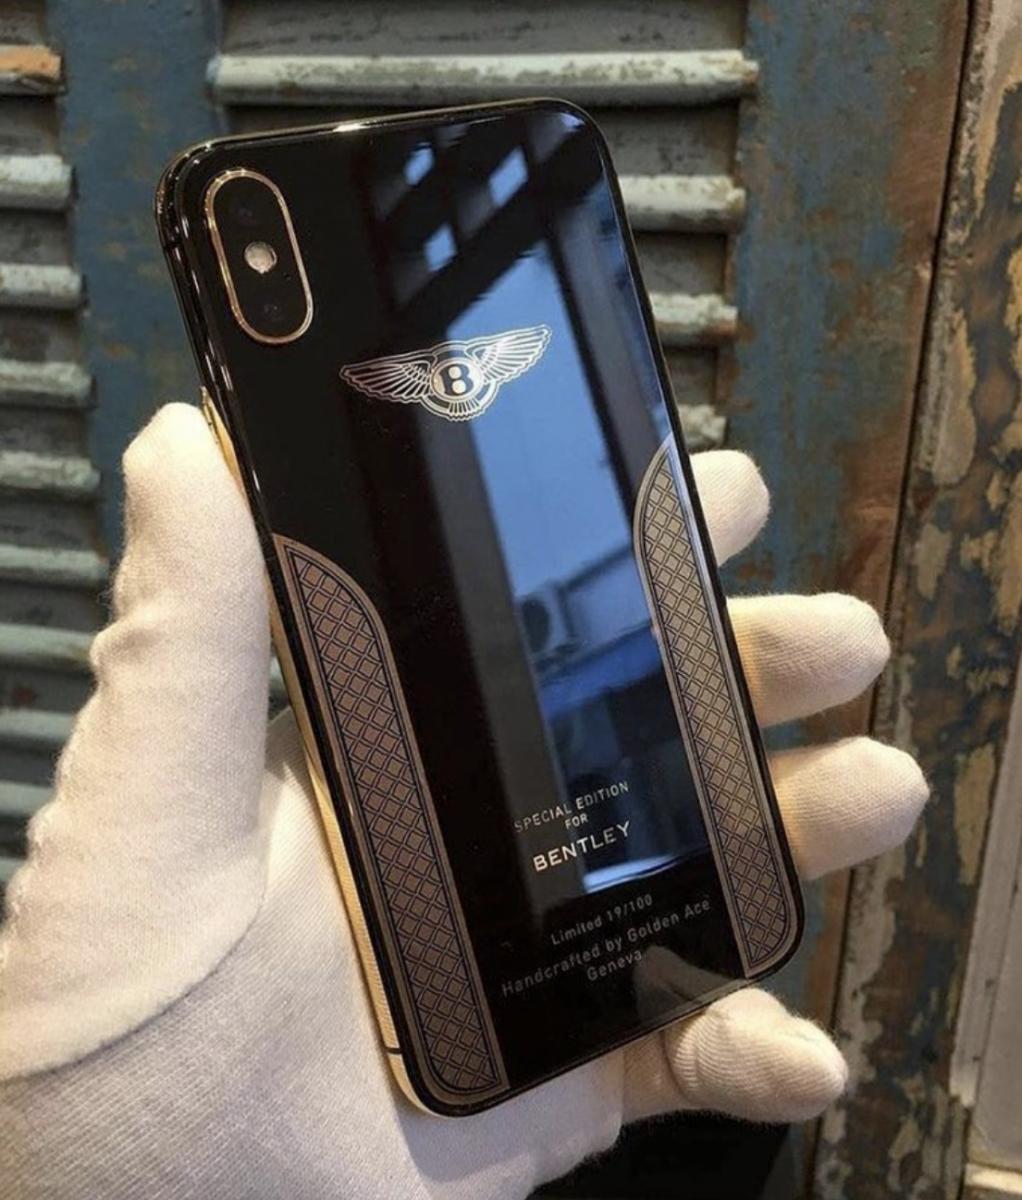 iPhone X Bentley Edition - svetapple.sk